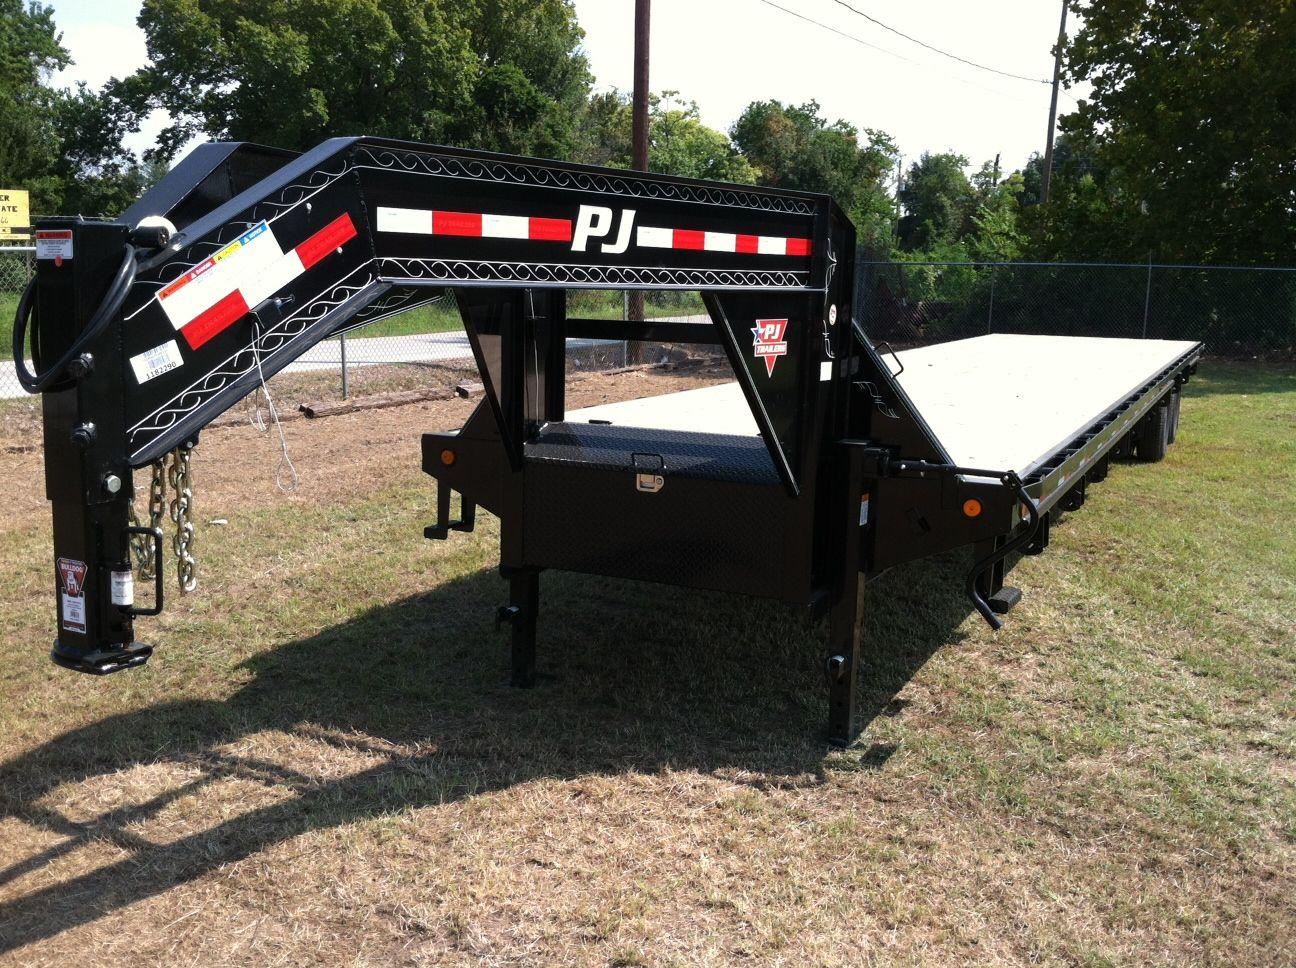 Pj Trailers Products Gooseneck Trailers Tilt Equipment Dump Trailers Car Hauler Deckover And Utility Trailers Compare Pj Trailers Trailer Dump Trailers